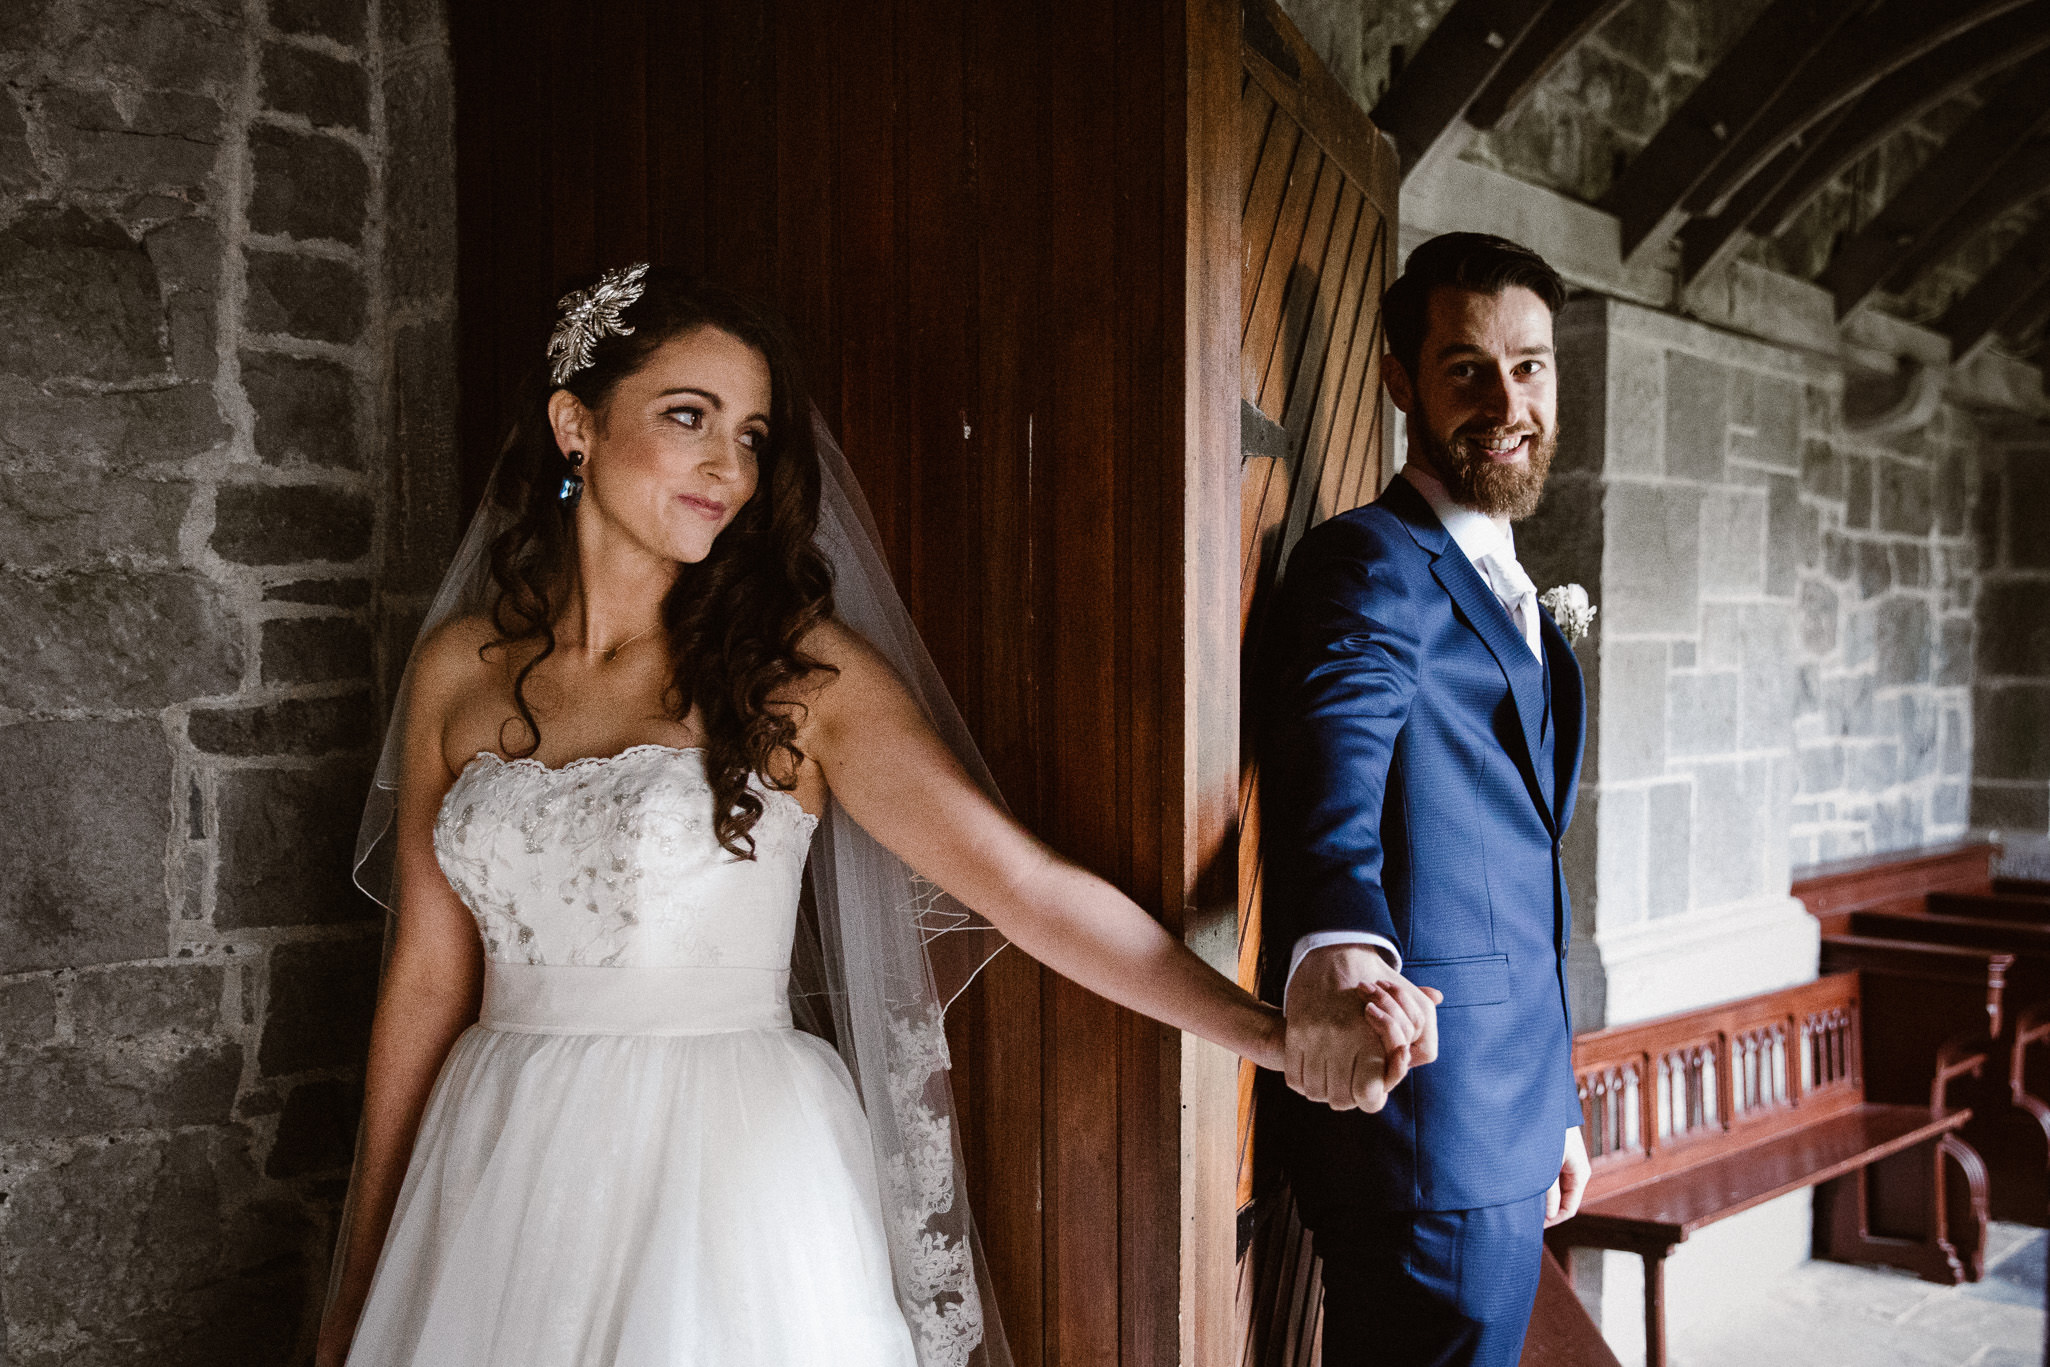 clairebyrnephotography-wedding-night-sparklers-new-years-eve-denyce-leonard-8.jpg